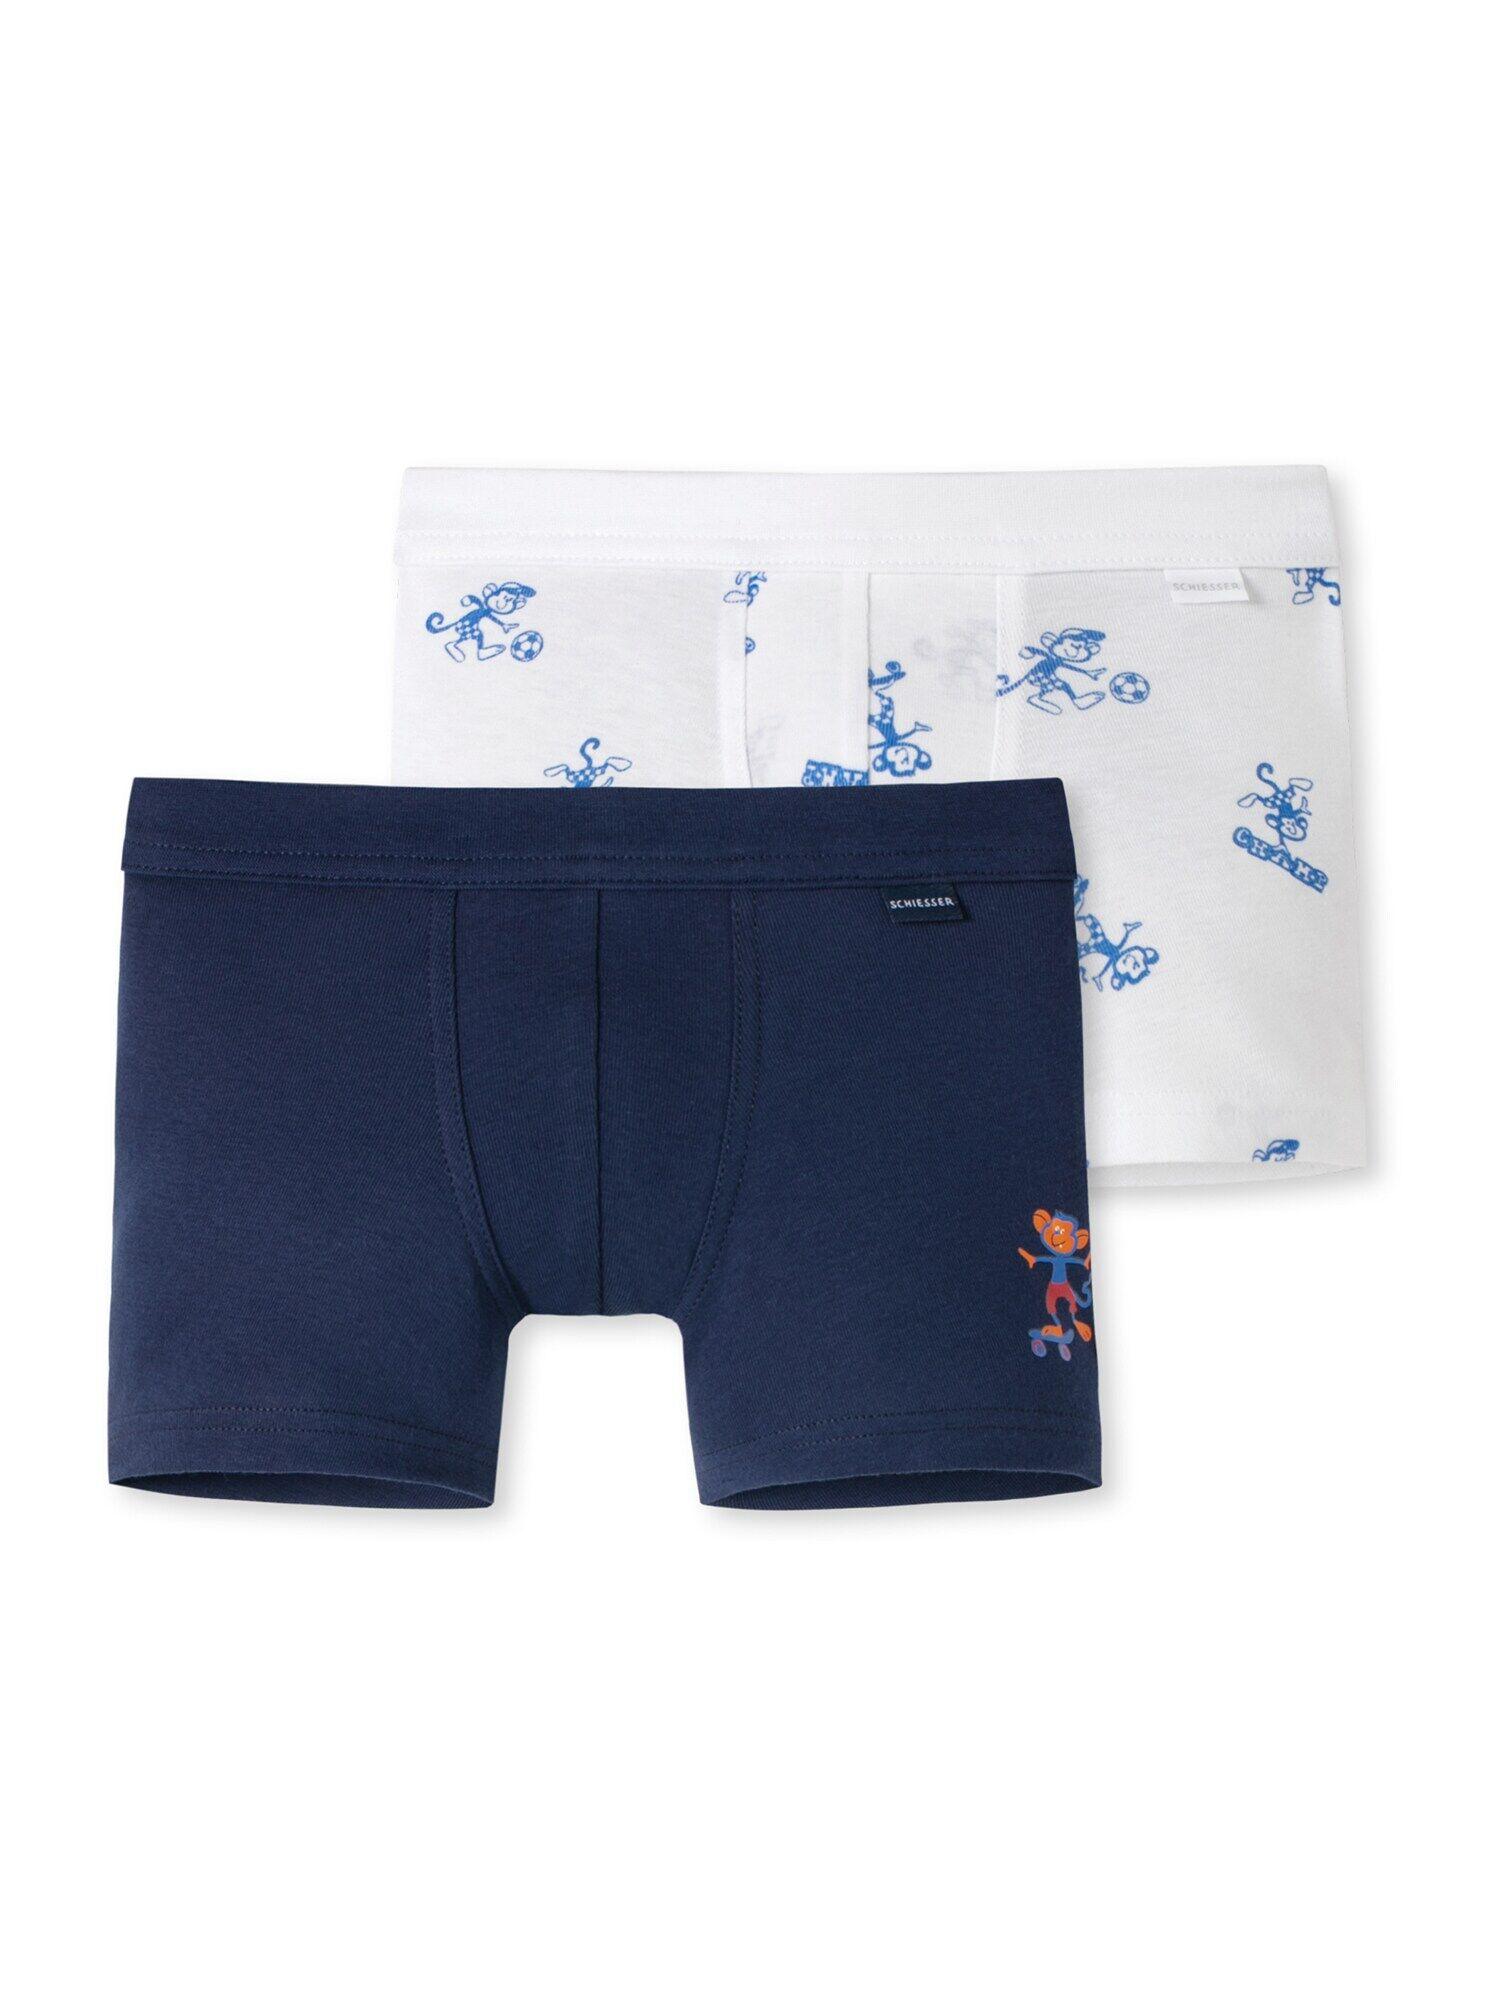 SCHIESSER Sous-vêtements ' 2er-Pack Friends 4 Life '  - Bleu, Blanc - Taille: 92 - boy